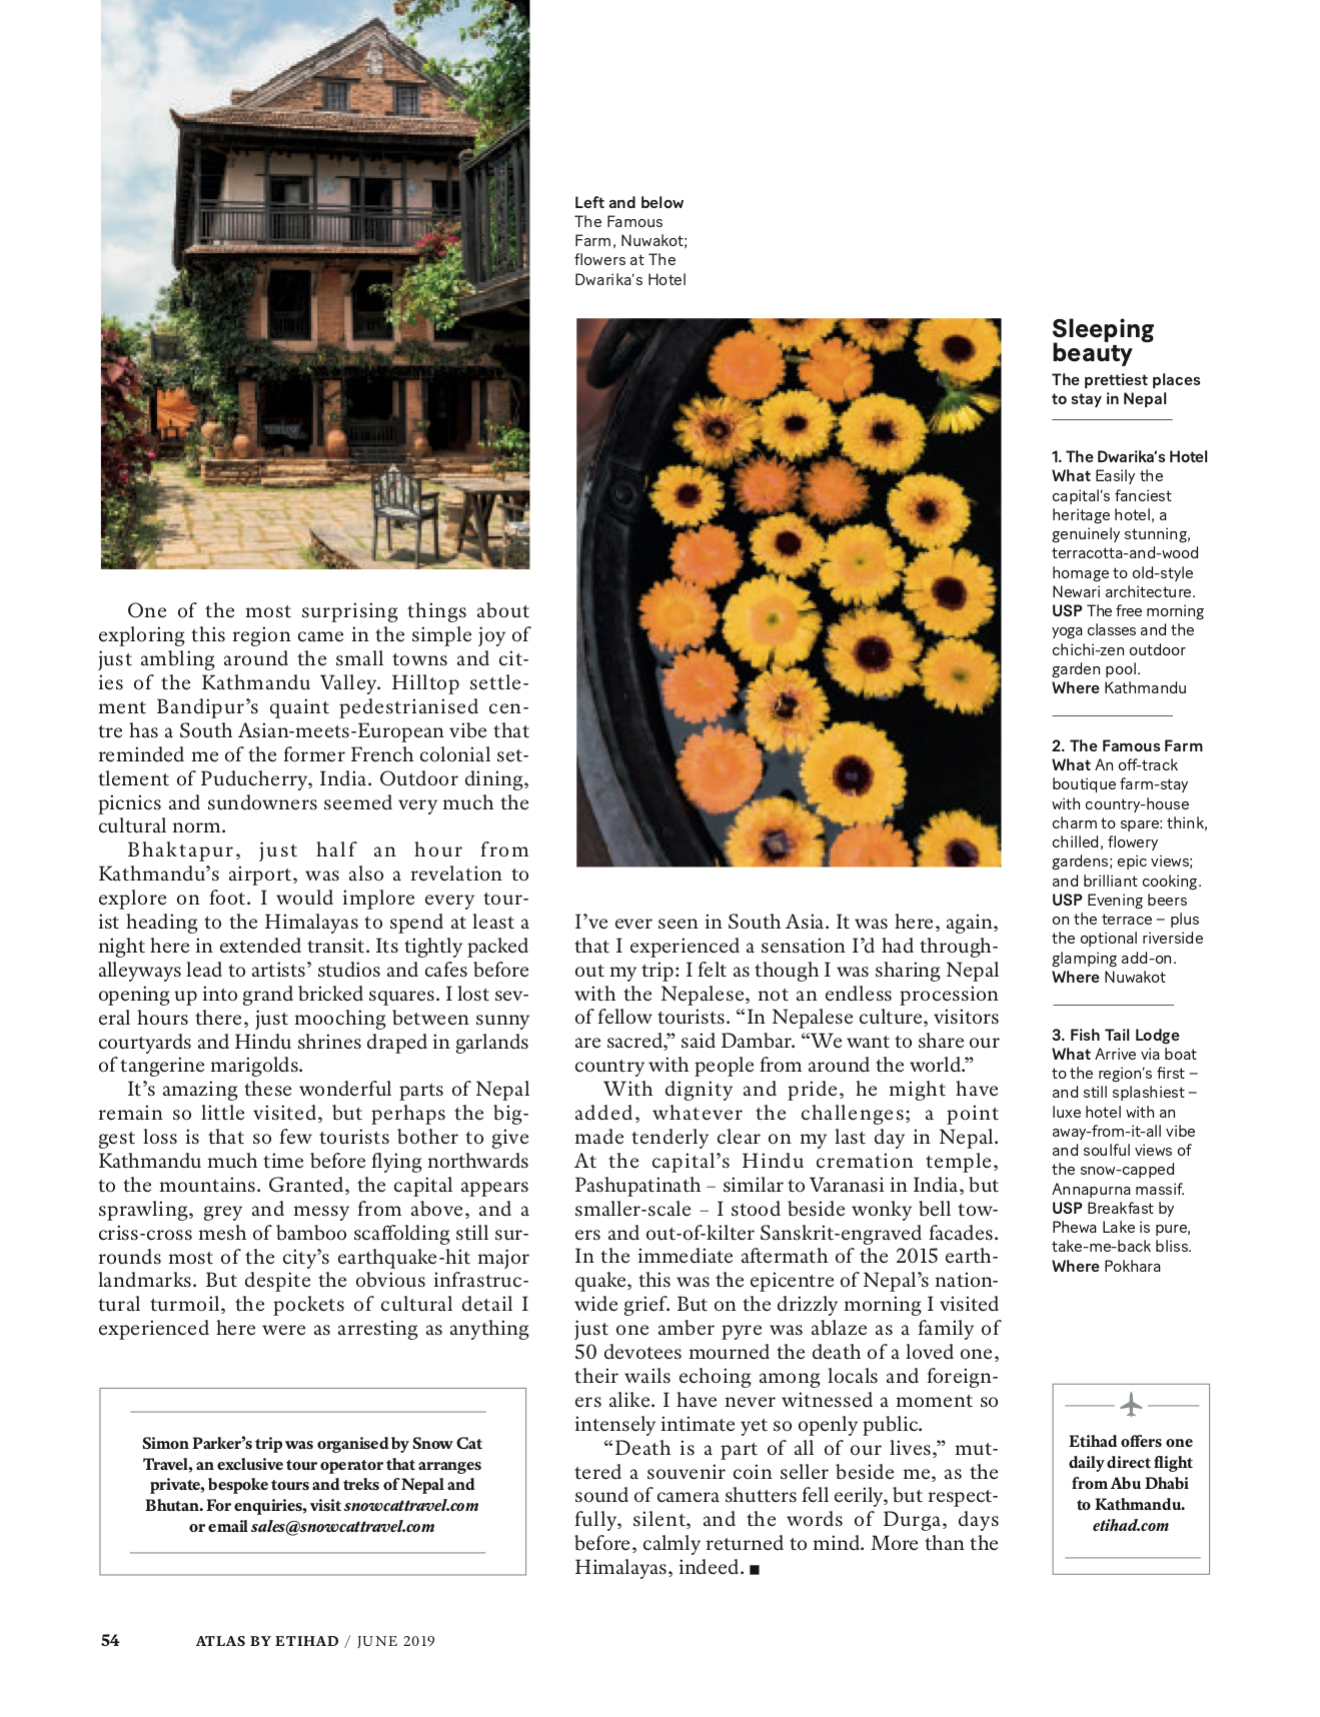 BenReadPhotography-Ink-Atlas-Etihad-Nepal-6.JPG